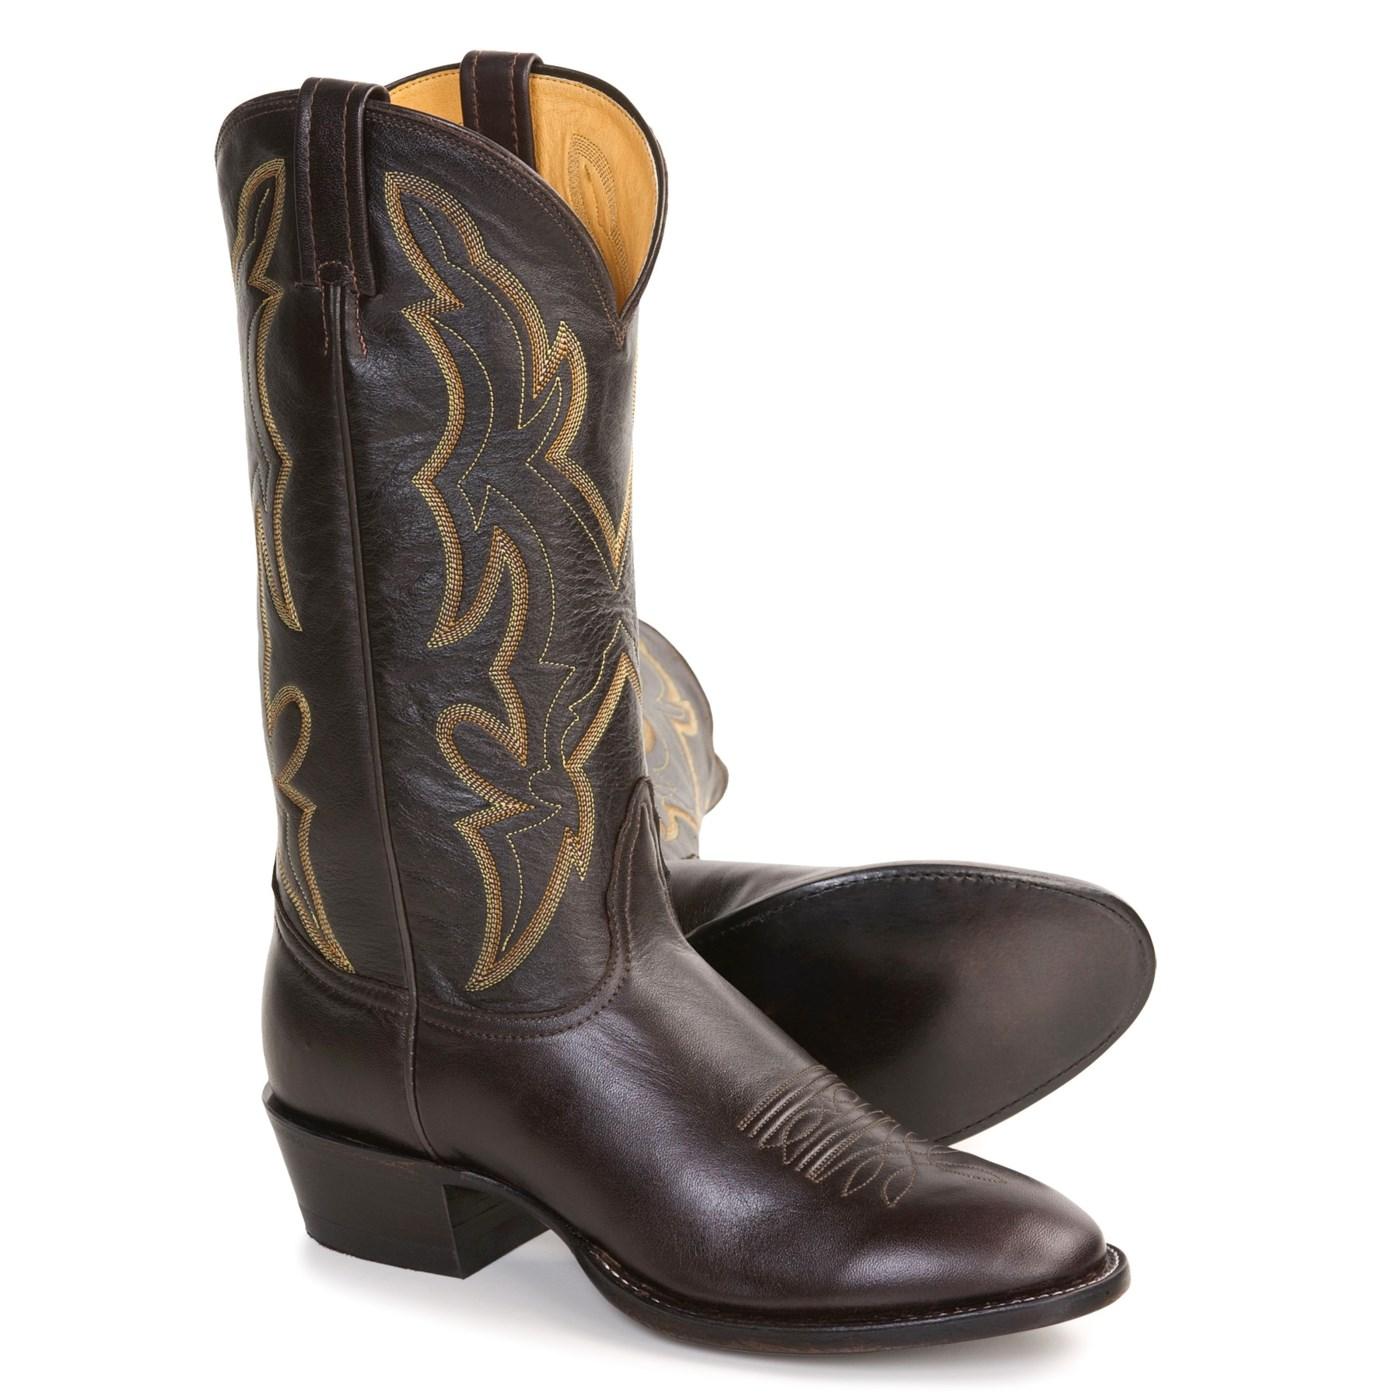 b12c8bca706 Nocona Lux Calfskin Cowboy Boots (For Men) 2496F 33 on PopScreen